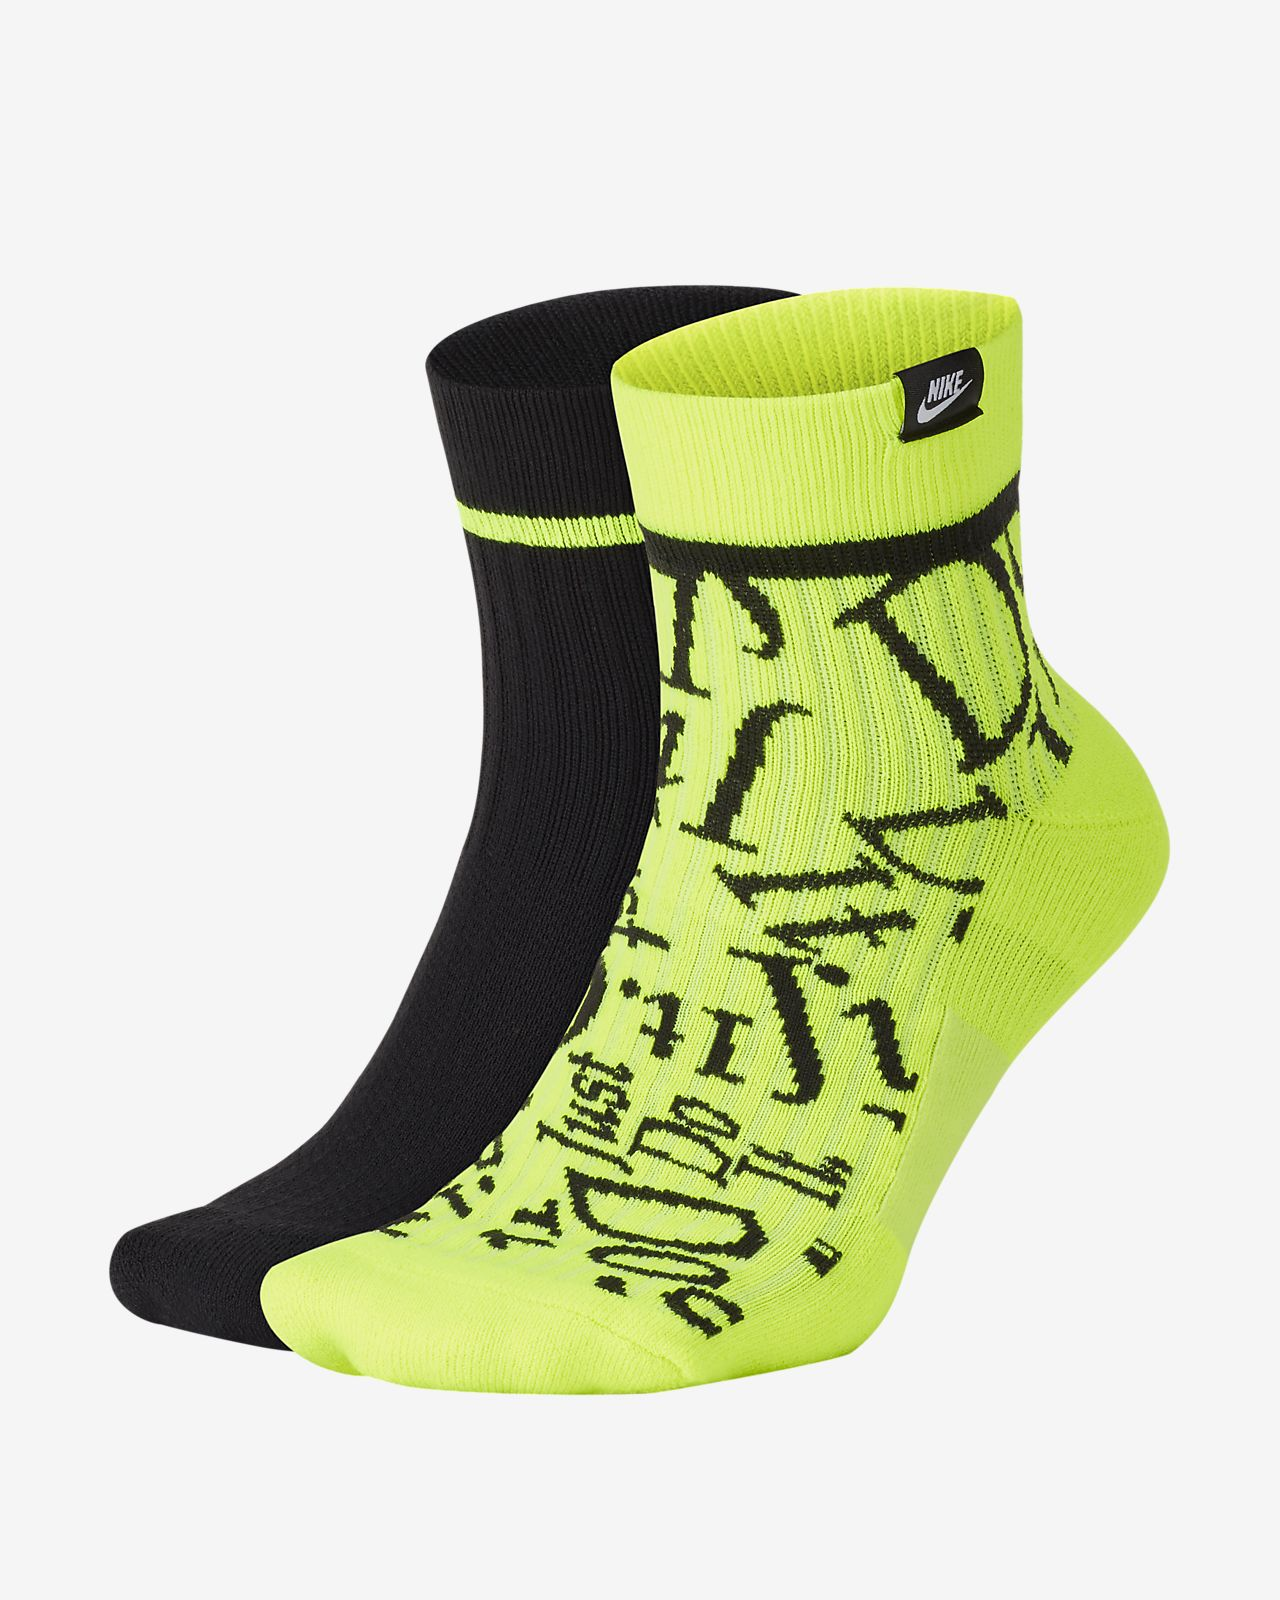 Nike SNKR Sox JDI Ankle Socks (2 Pairs)